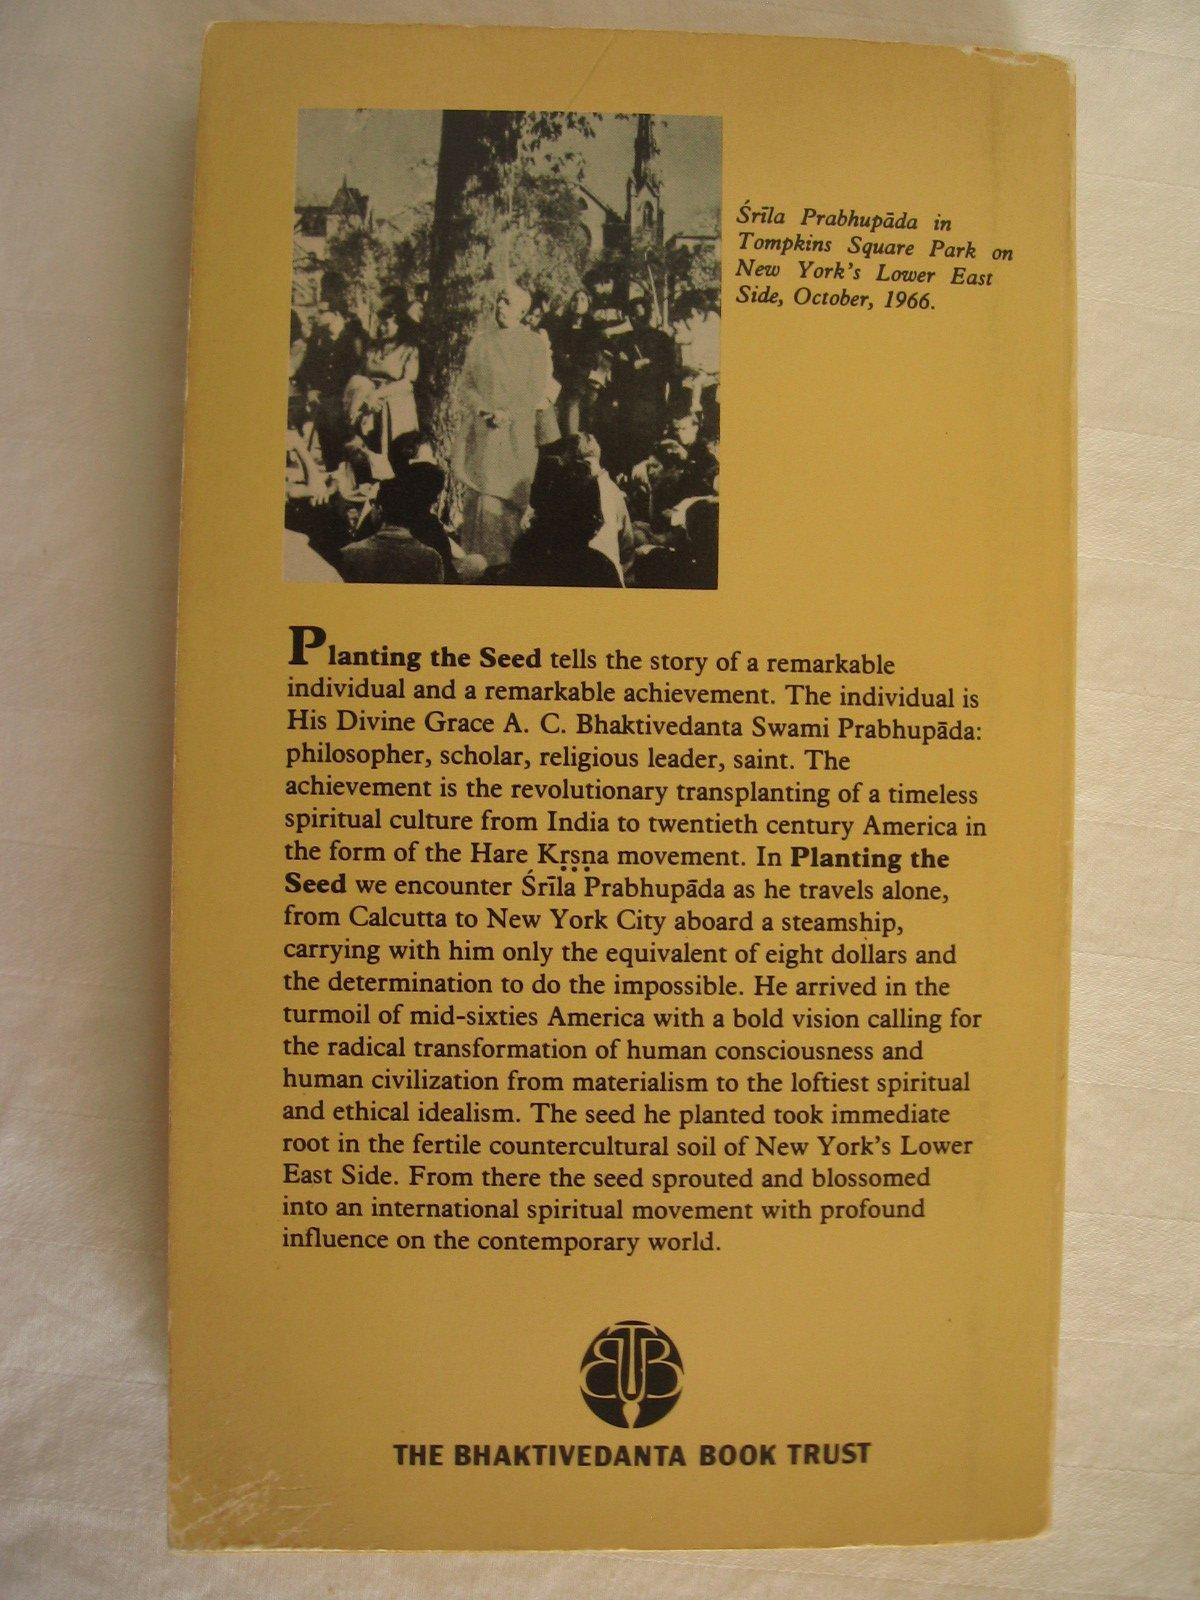 Srila Prabhupada-Lilamrta: A Biography of His Divine Grace A.C. Bhaktivedanta Swami Prabhupada, Vol.